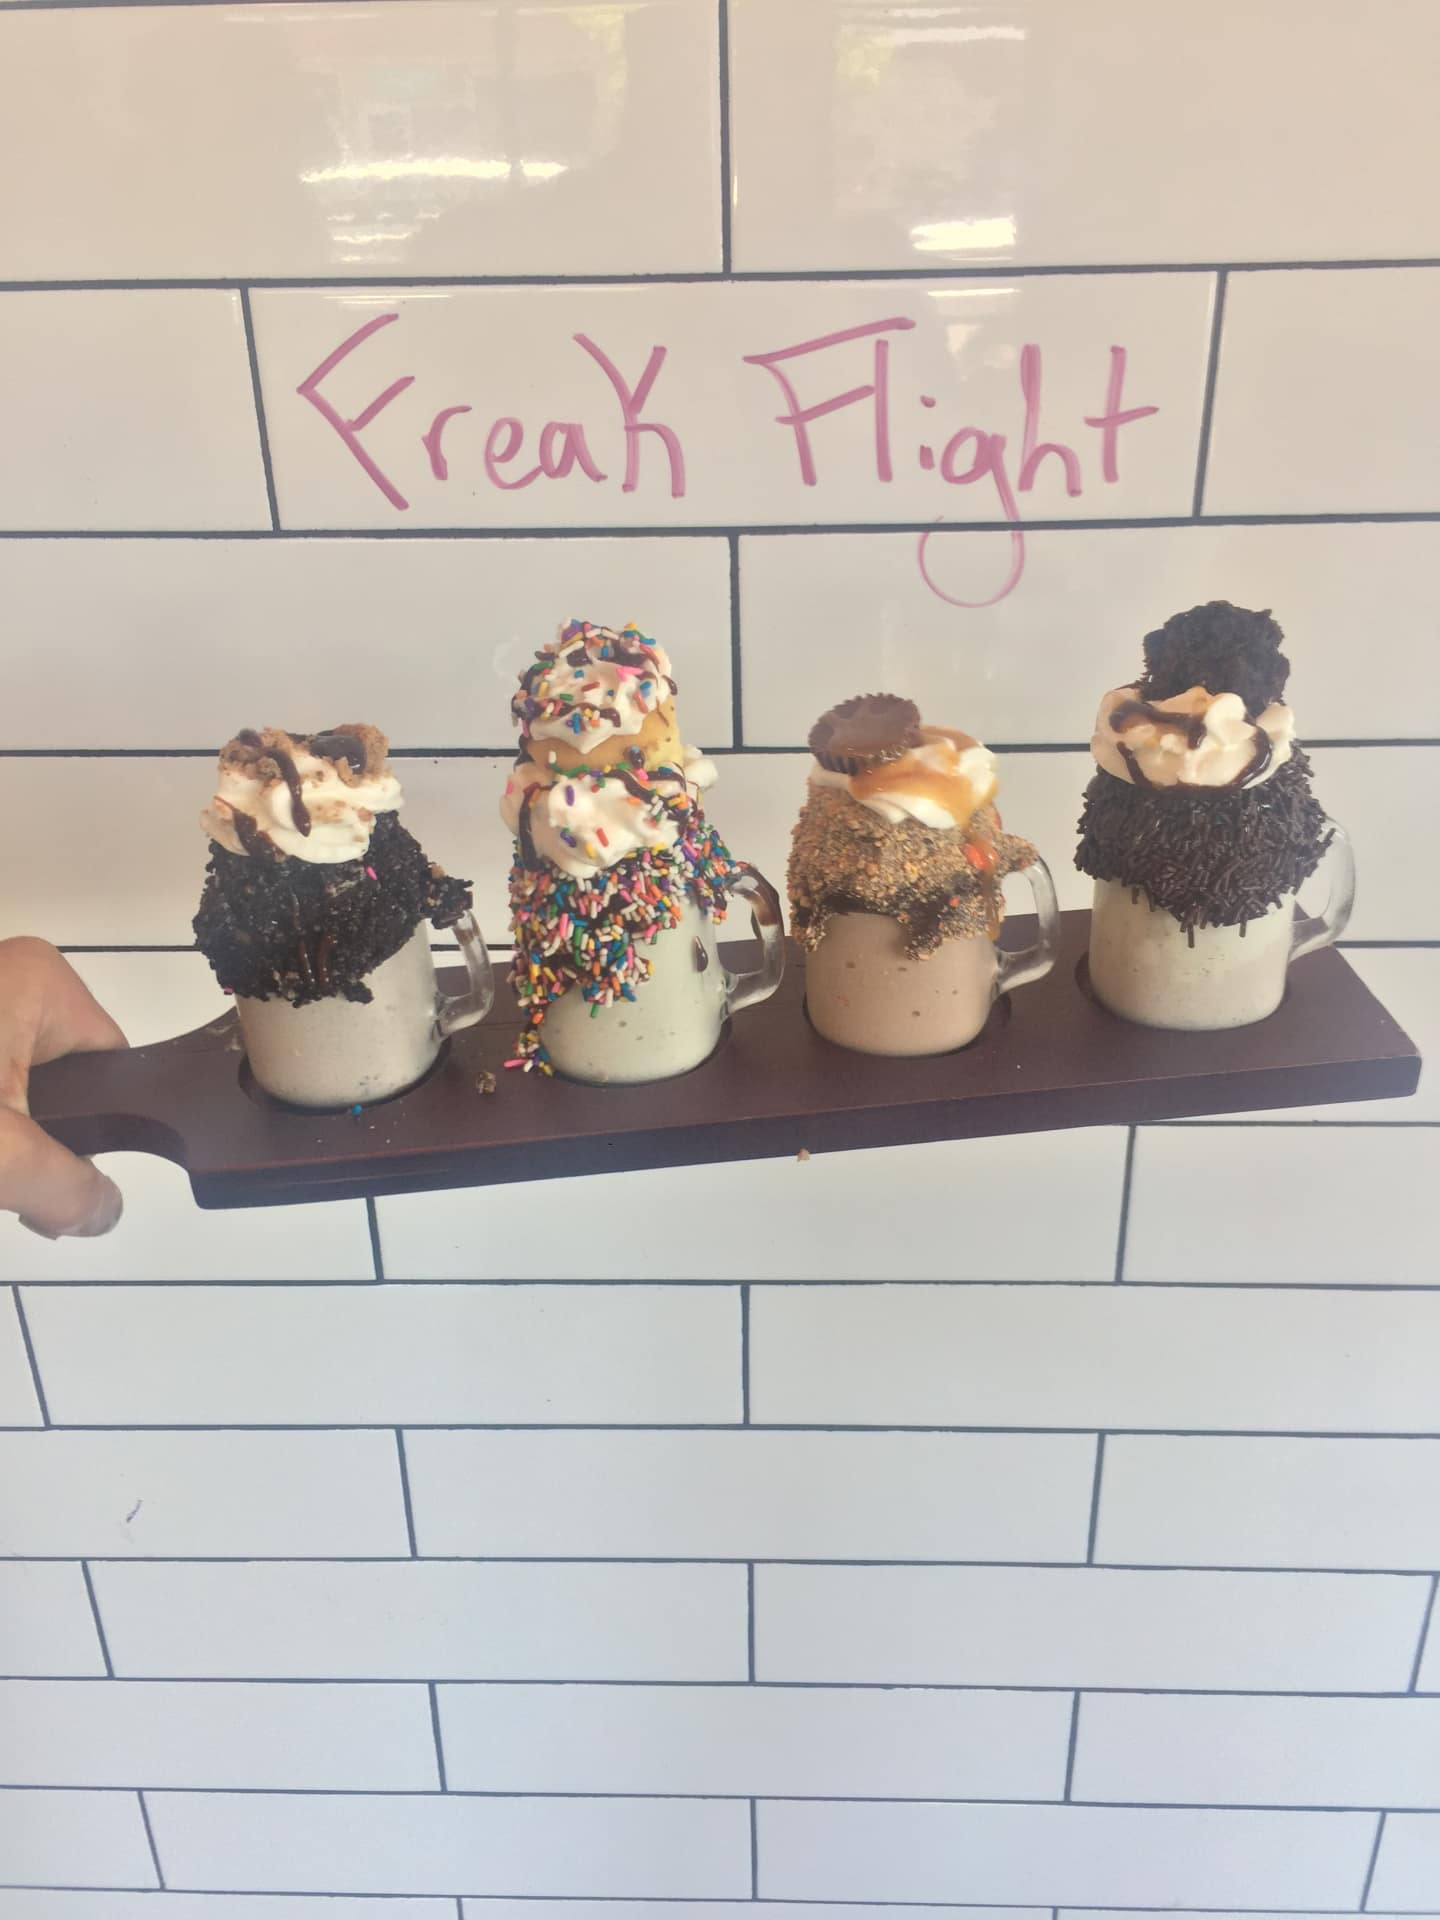 Freak Flight